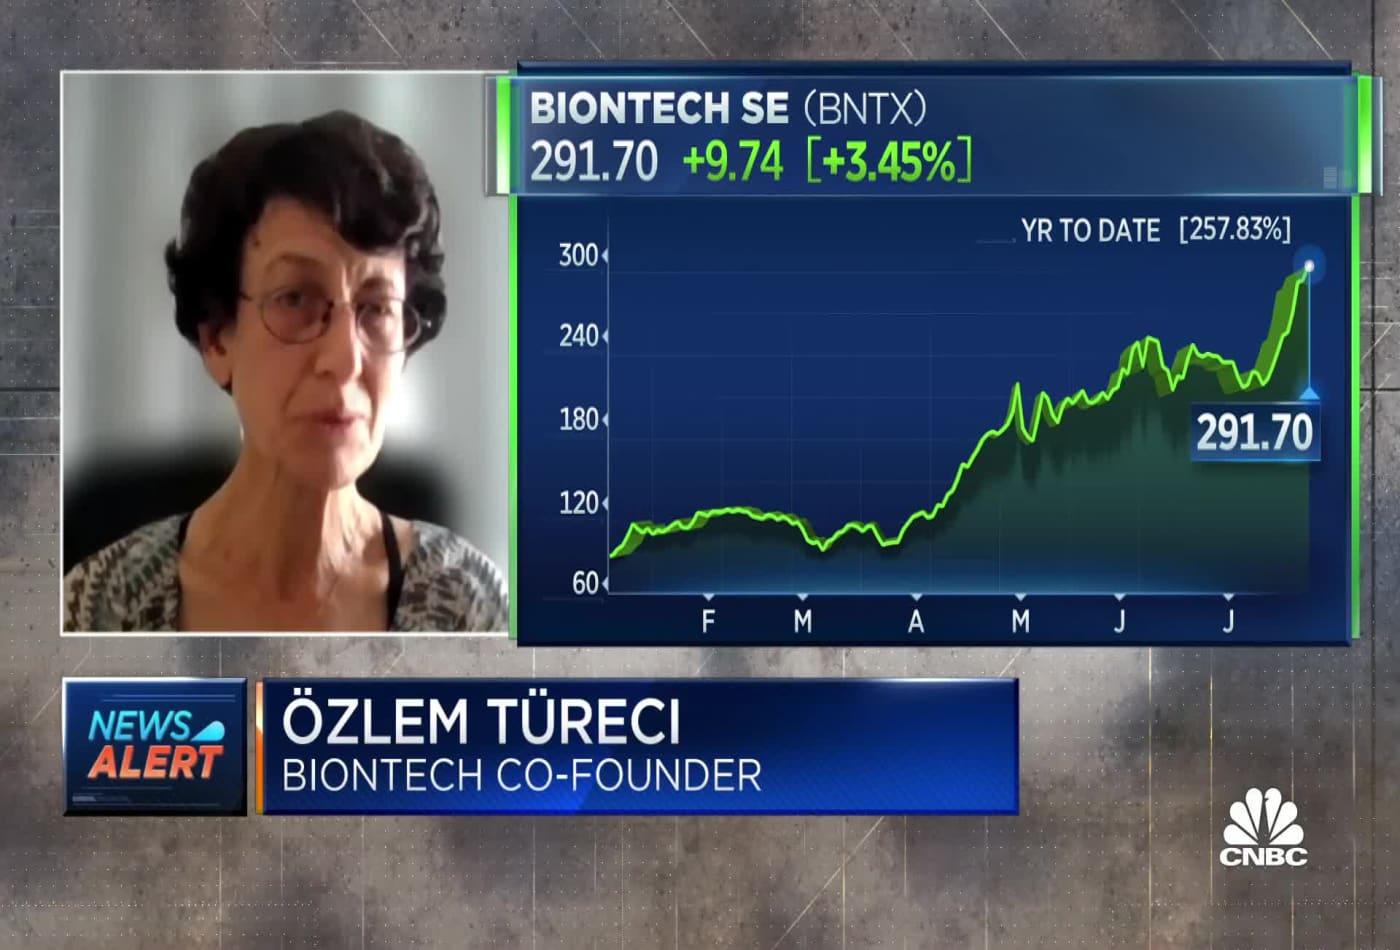 BioNTech's Ozlem Tureci on malaria vaccine development